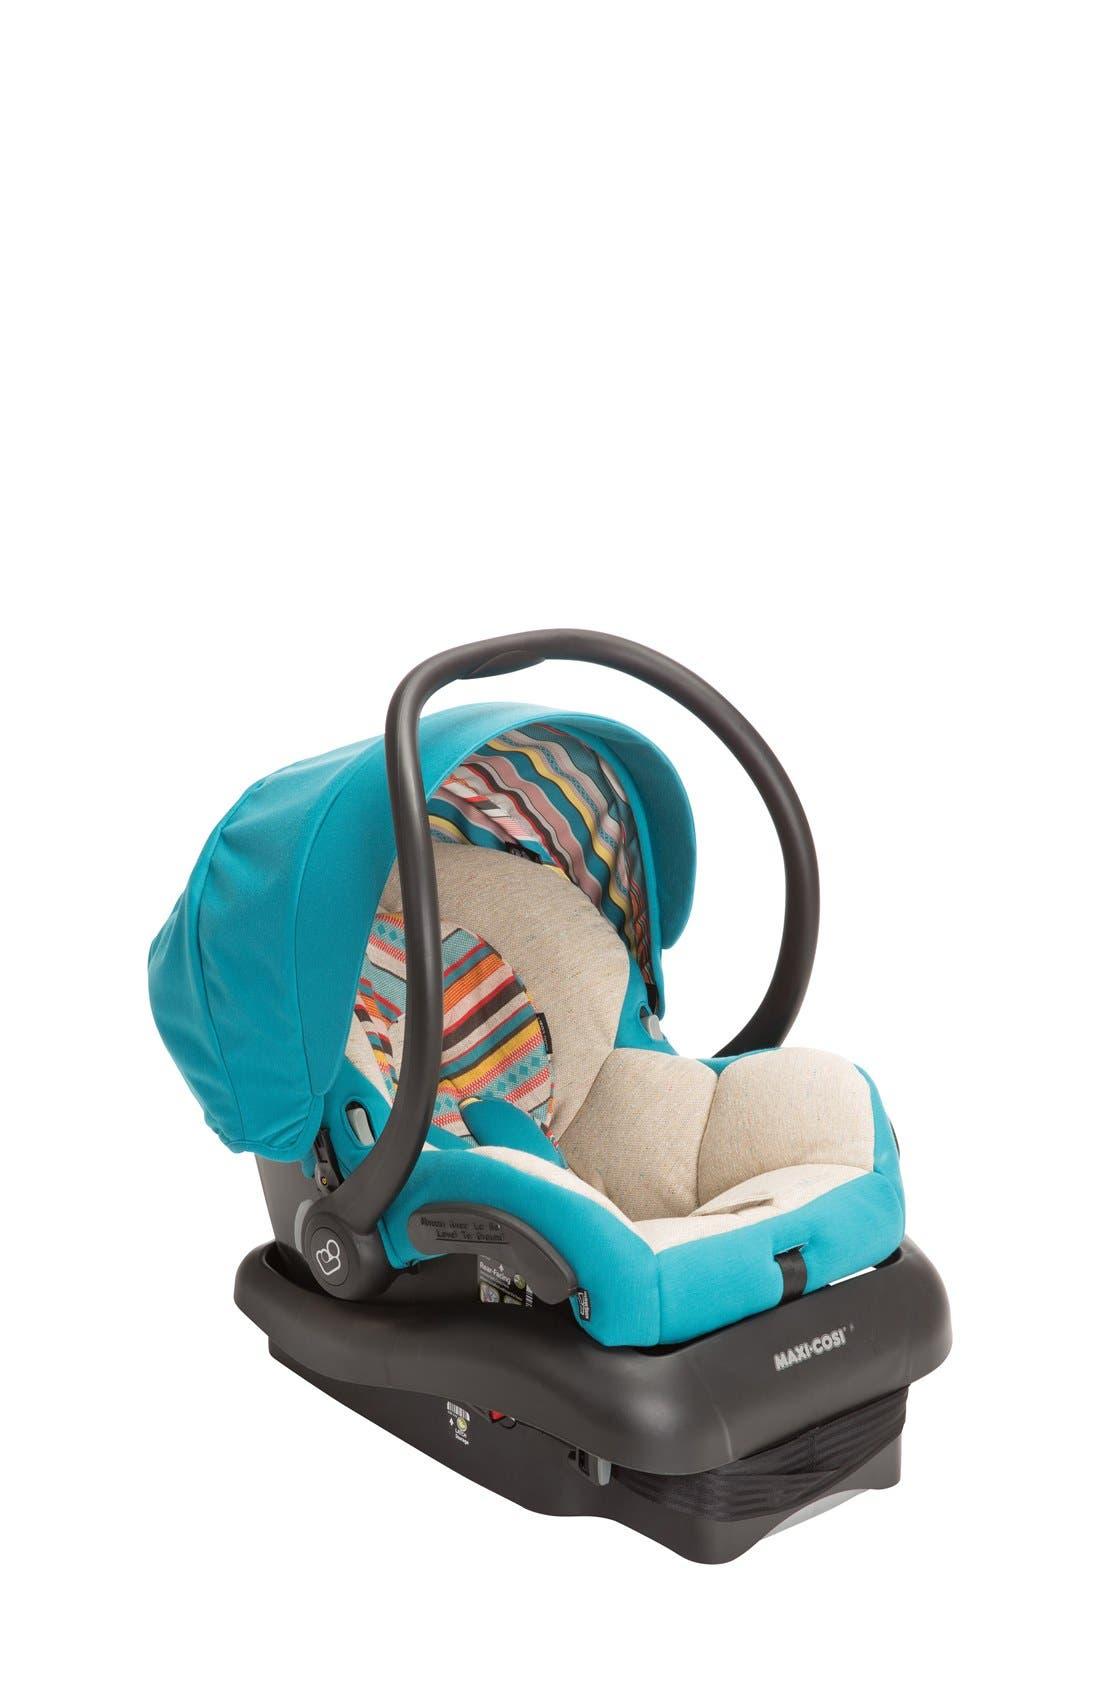 Main Image - Maxi-Cosi® 'Mico AP' Infant Car Seat